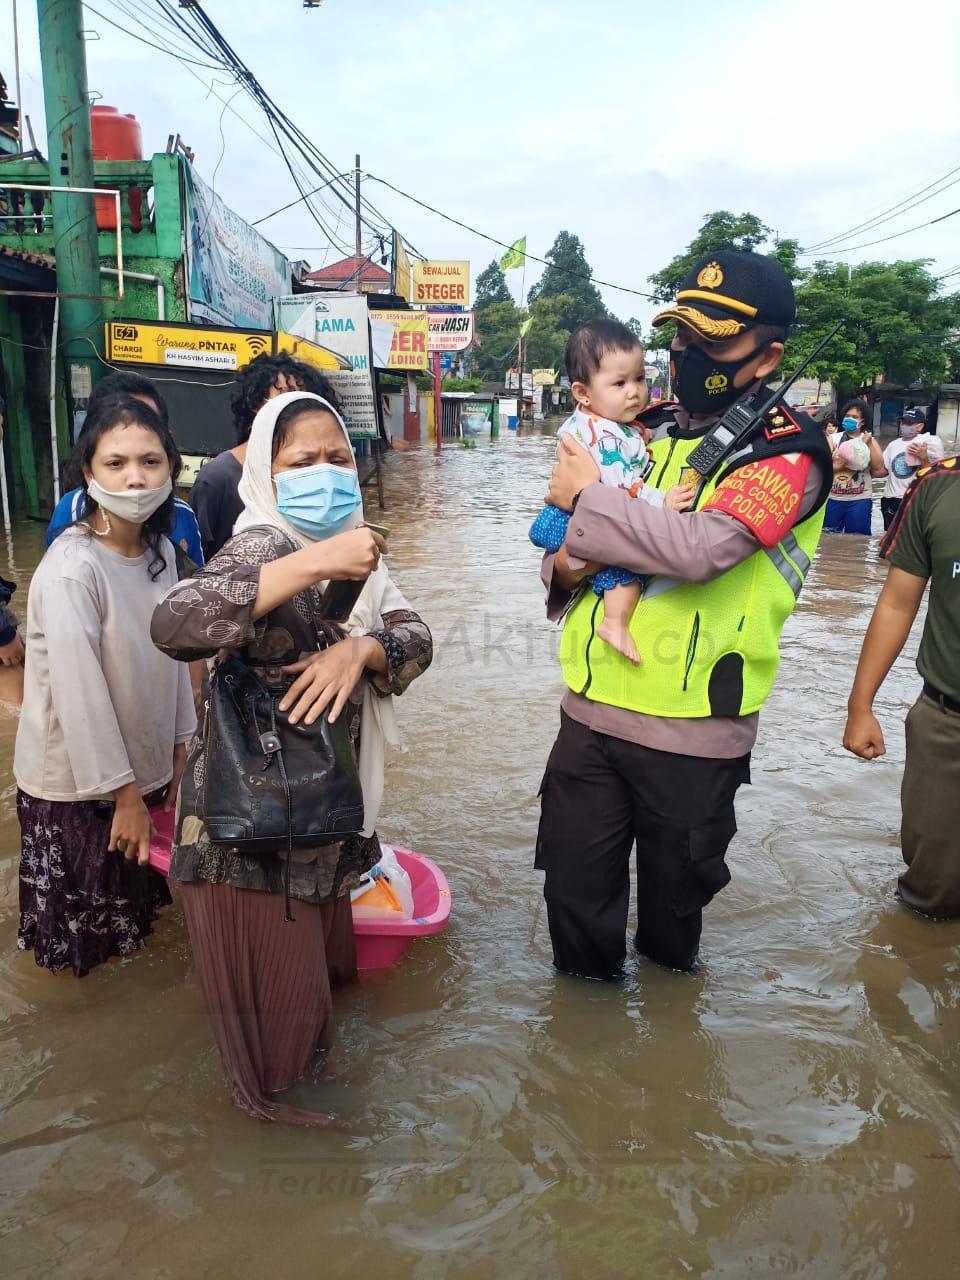 TNI-Polri Evakuasi Korban Banjir di Setiap Titik Wilayah DKI Jakarta 3 IMG 20210221 WA0037